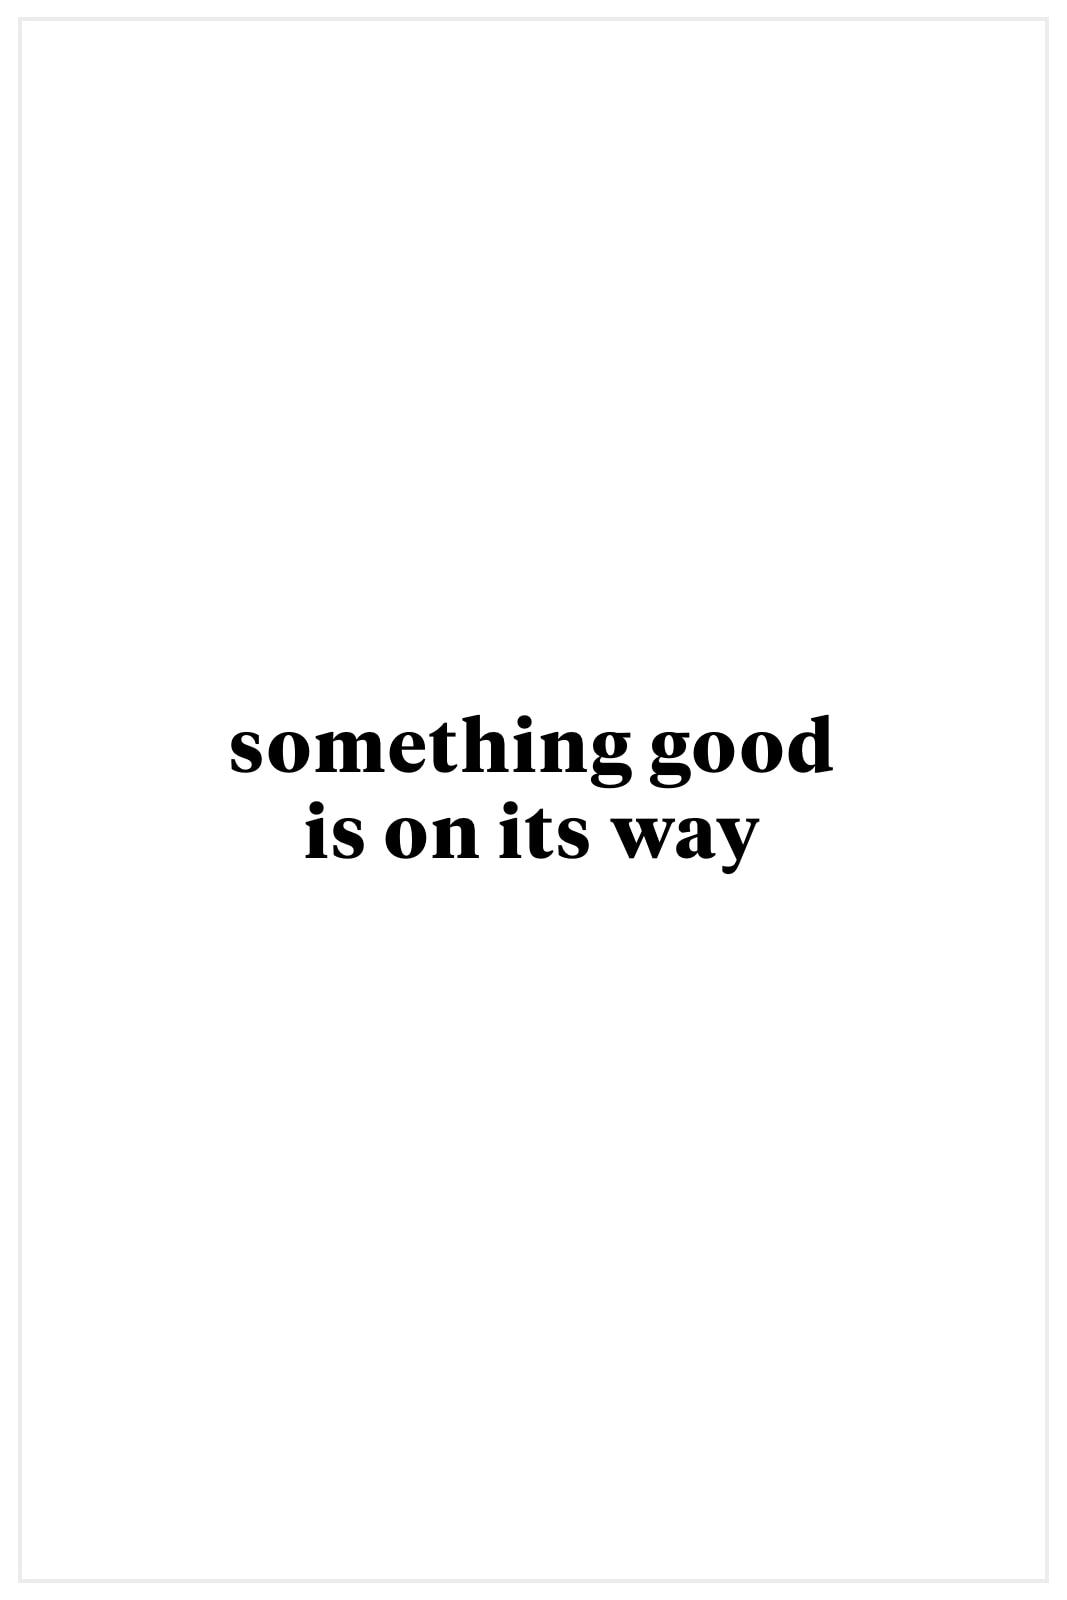 e4602cb2c36 Shop Dresses - EVEREVE - a contemporary fashion and styling company ...